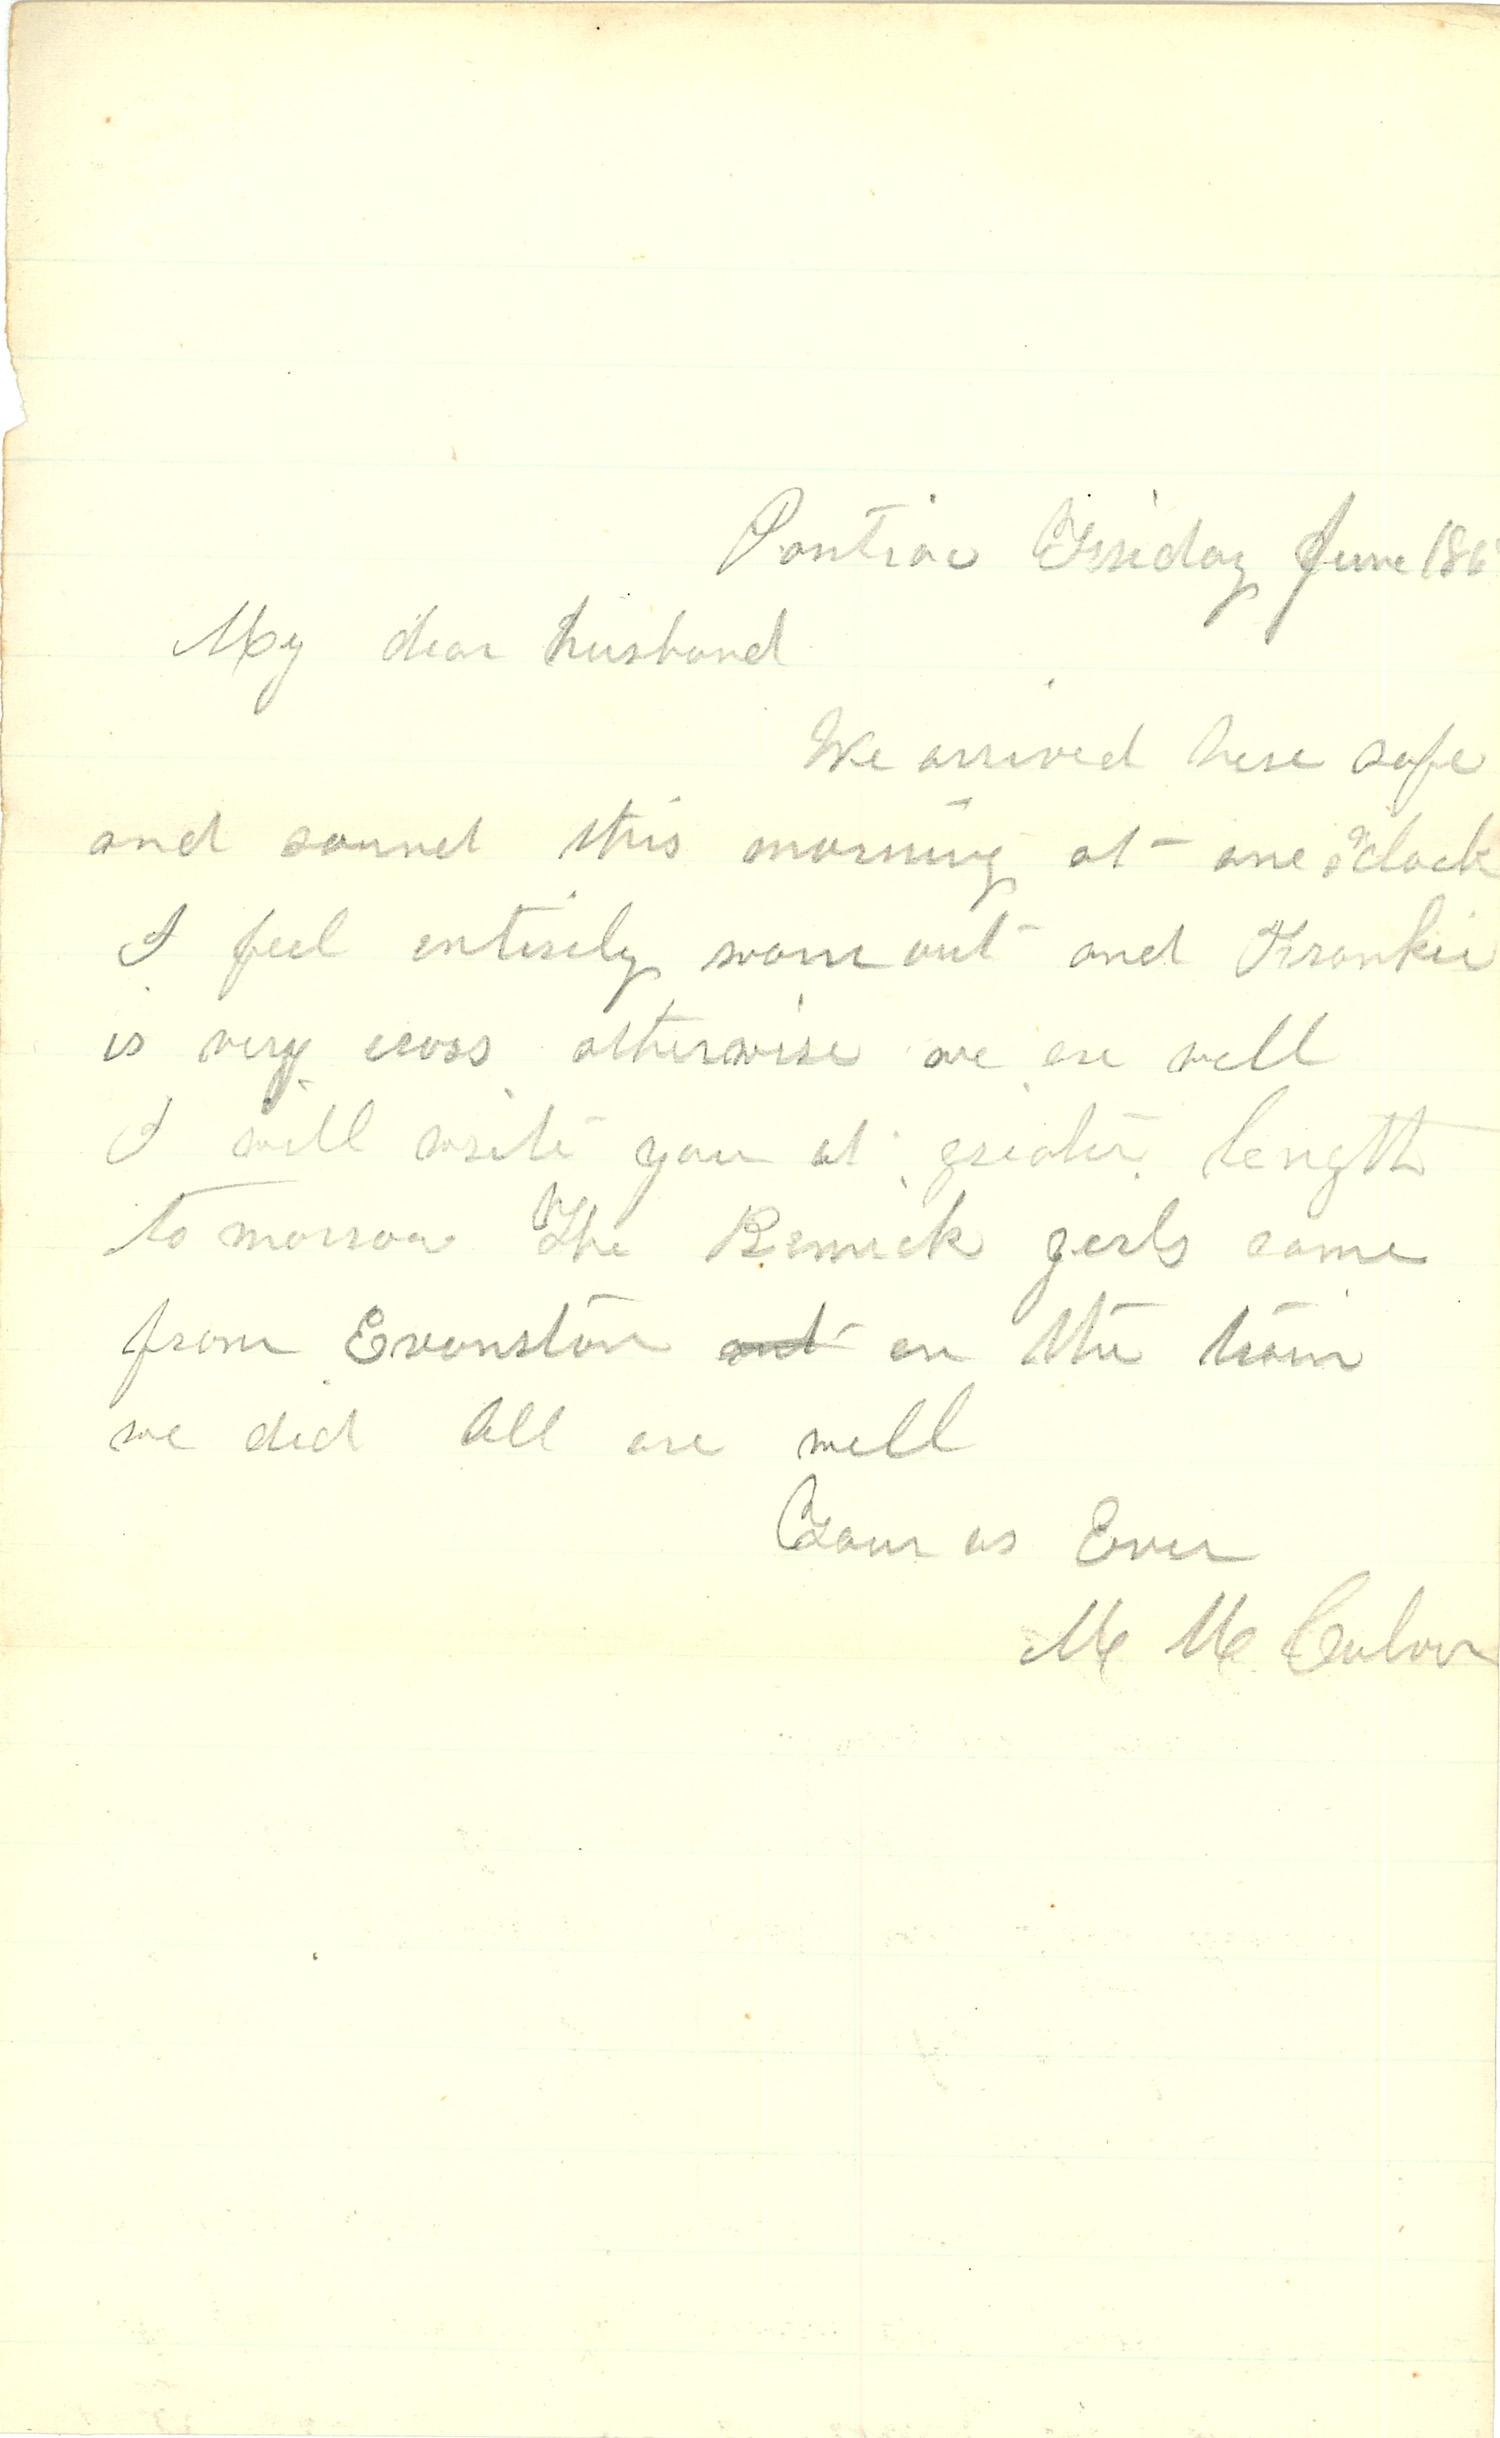 Joseph Culver Letter, June 1, 1863, Page 1